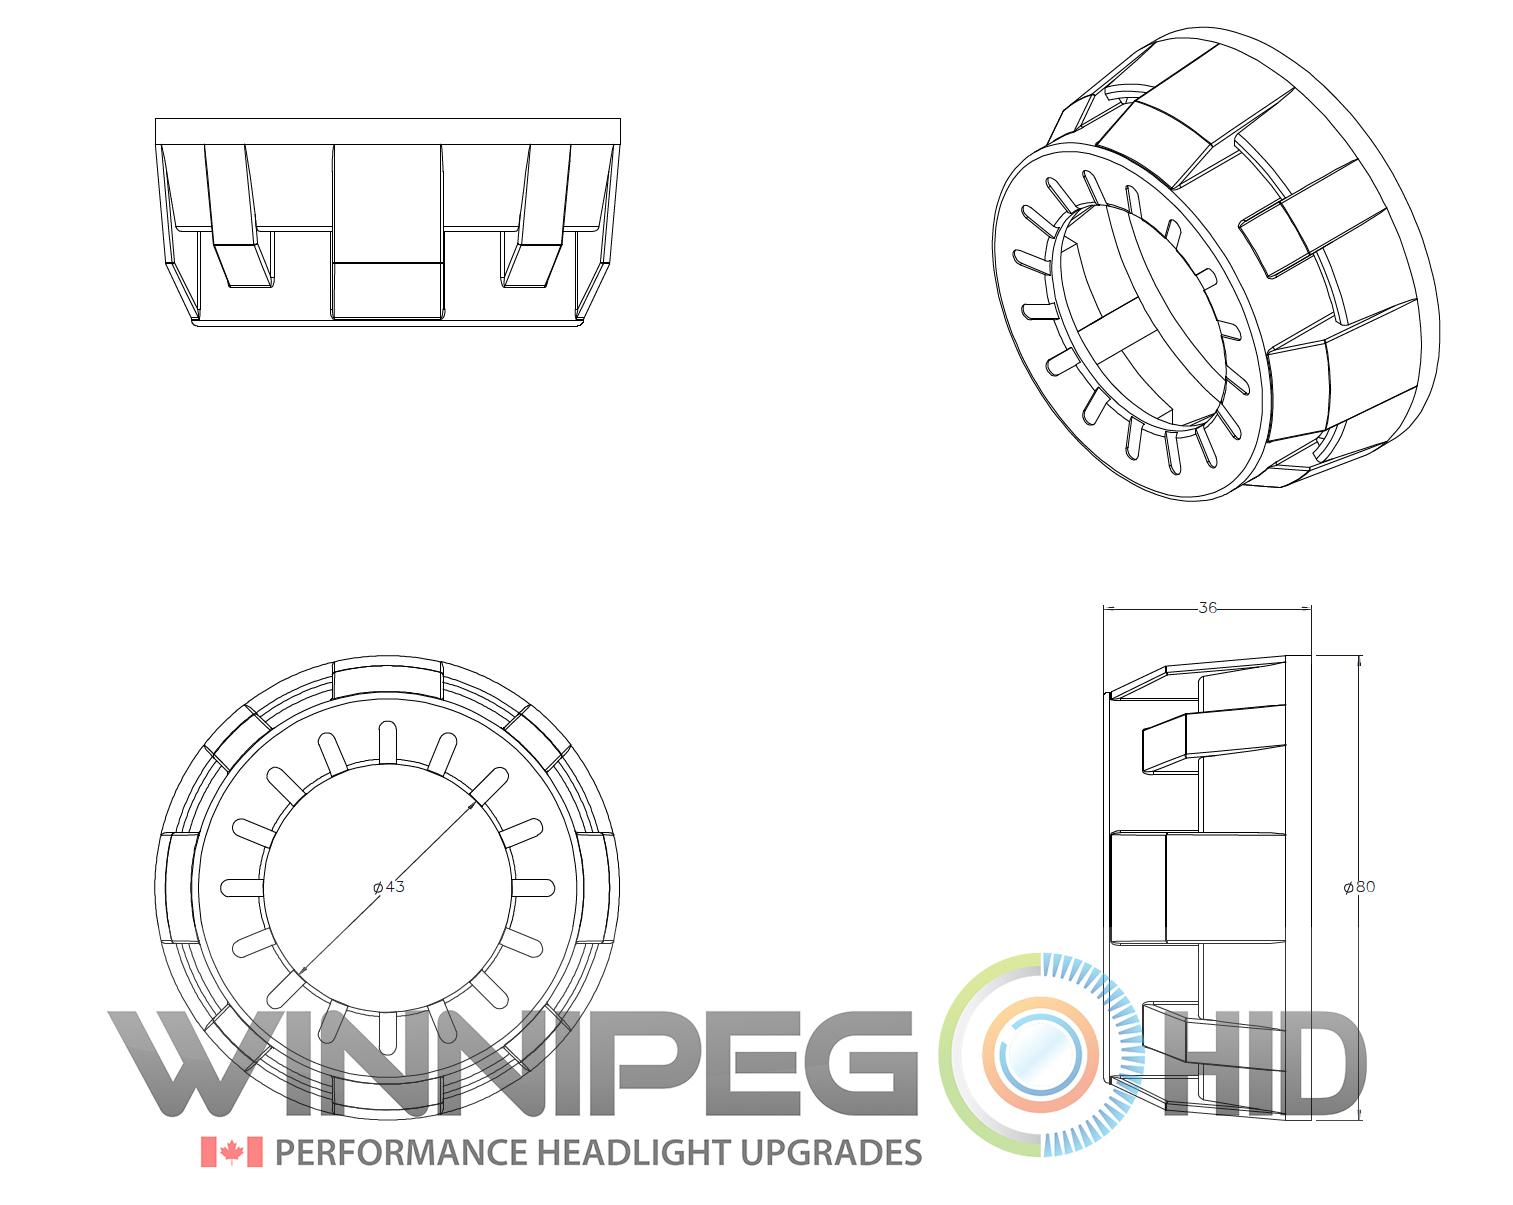 Kensun Hid H3 Wiring Diagram | New Wiring Resources 2019 on mustang wiring diagram, yukon wiring diagram, fusion wiring diagram, a2 wiring diagram, h4 wiring diagram, t1 wiring diagram, g6 wiring diagram, h13 wiring diagram, es 350 wiring diagram, camaro wiring diagram, traverse wiring diagram, d2 wiring diagram, hummer wiring diagram, armada wiring diagram, e1 wiring diagram, l3 wiring diagram, suburban wiring diagram, ul wiring diagram, t35 wiring diagram, ranger wiring diagram,